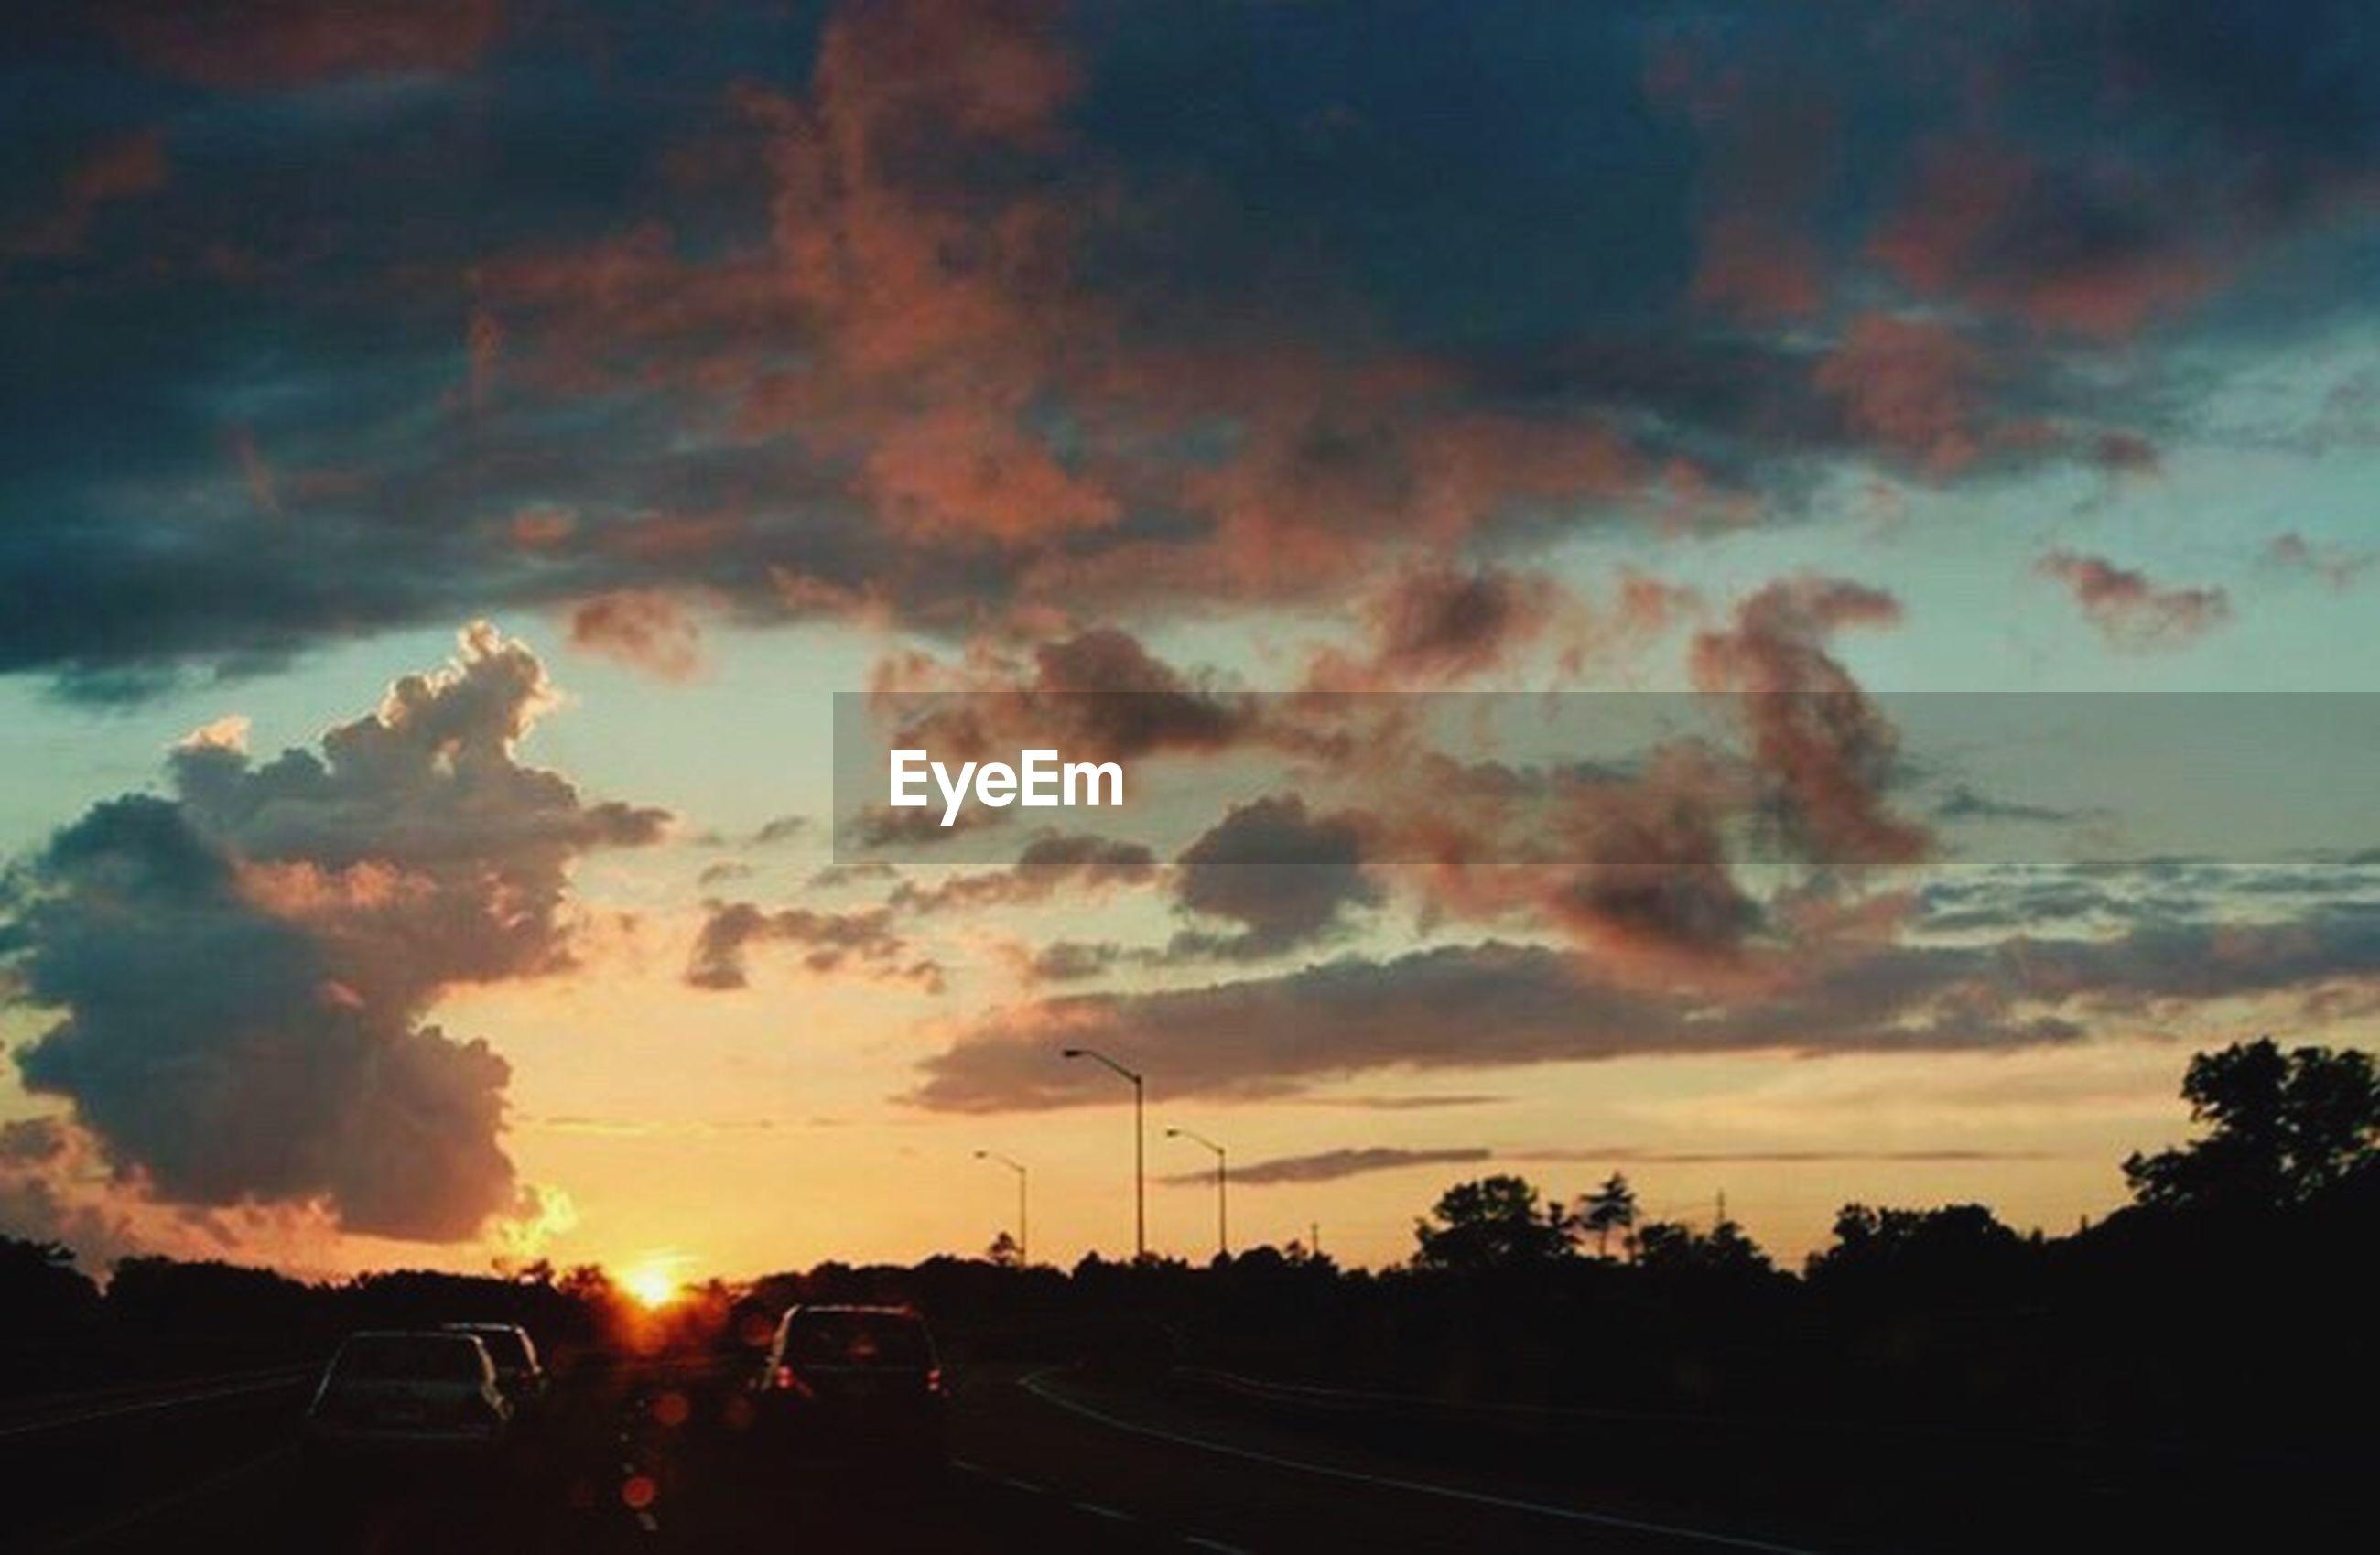 sunset, transportation, car, land vehicle, sky, road, mode of transport, cloud - sky, sun, silhouette, orange color, street, sunlight, tree, the way forward, sunbeam, beauty in nature, cloudy, nature, scenics